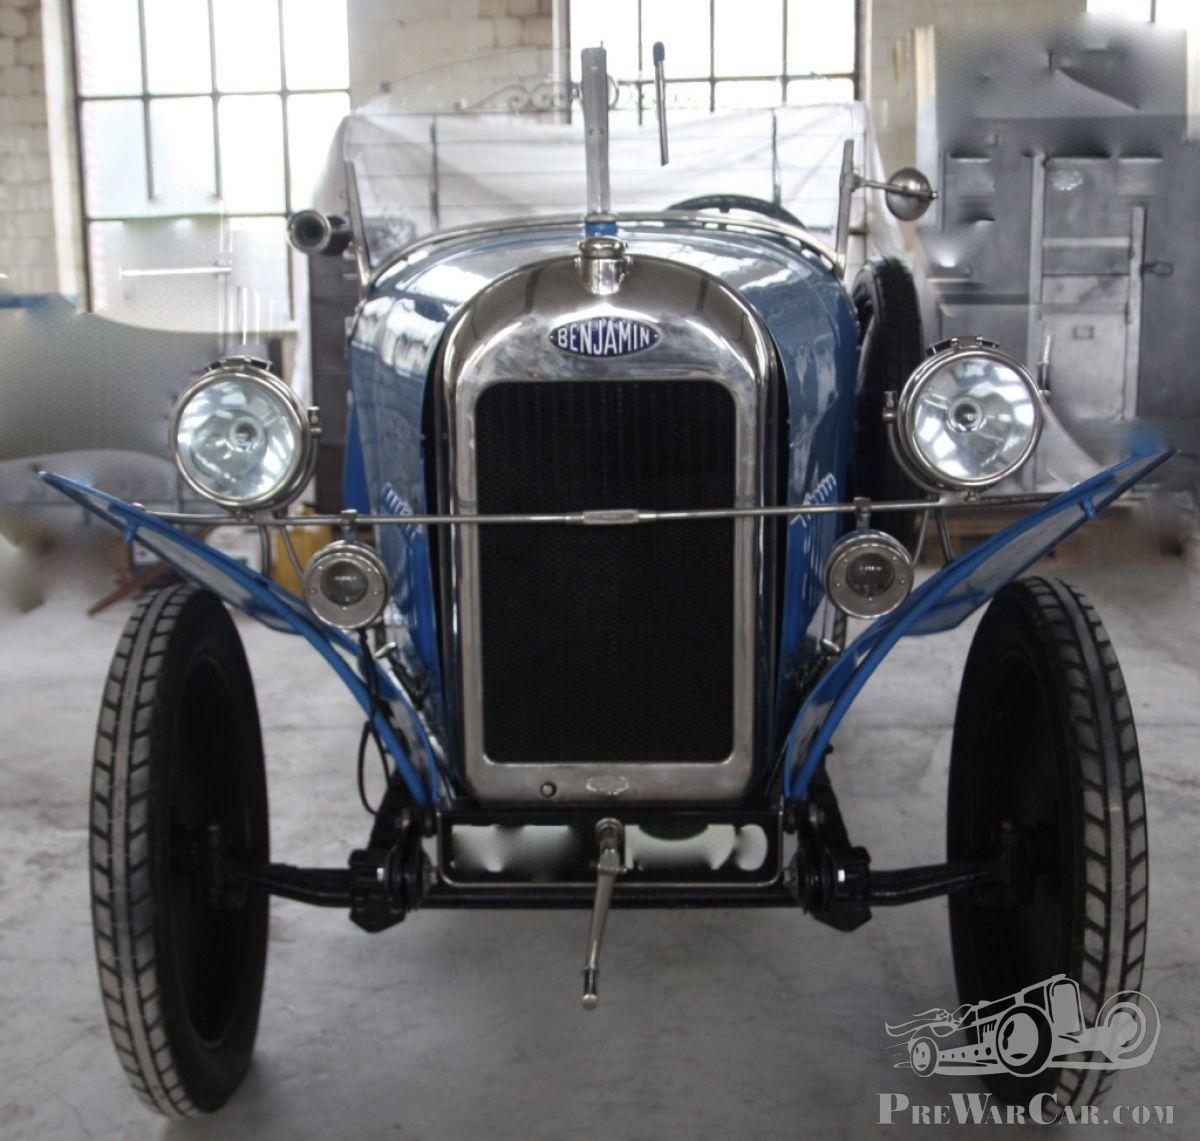 Car Benjamin Cyclecar P2 - 4 cylindres 1922 for sale - PreWarCar